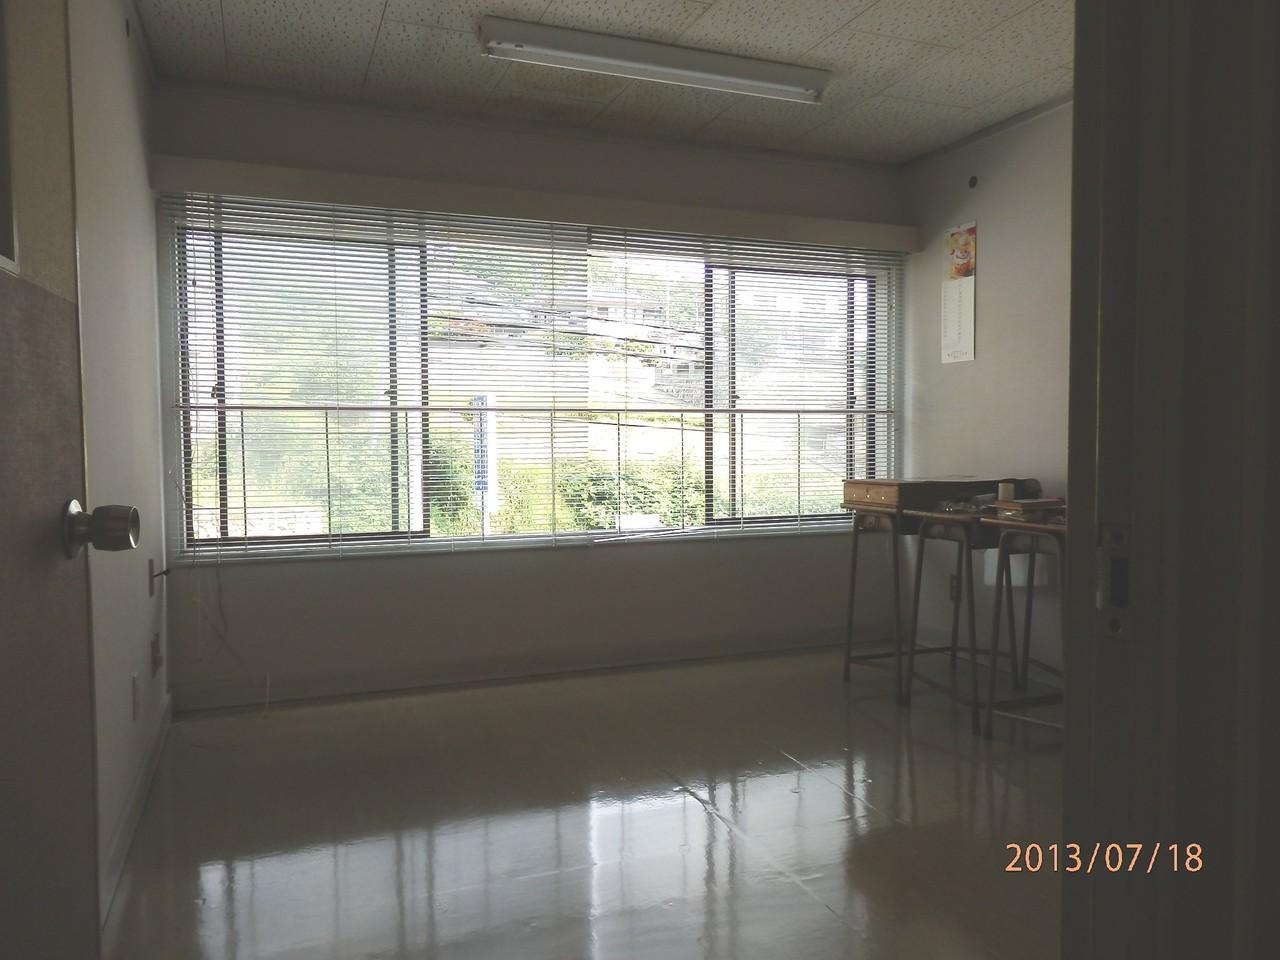 KECビル2階、203号室(2.5坪)内部(電子機器開発・試作室として使用)